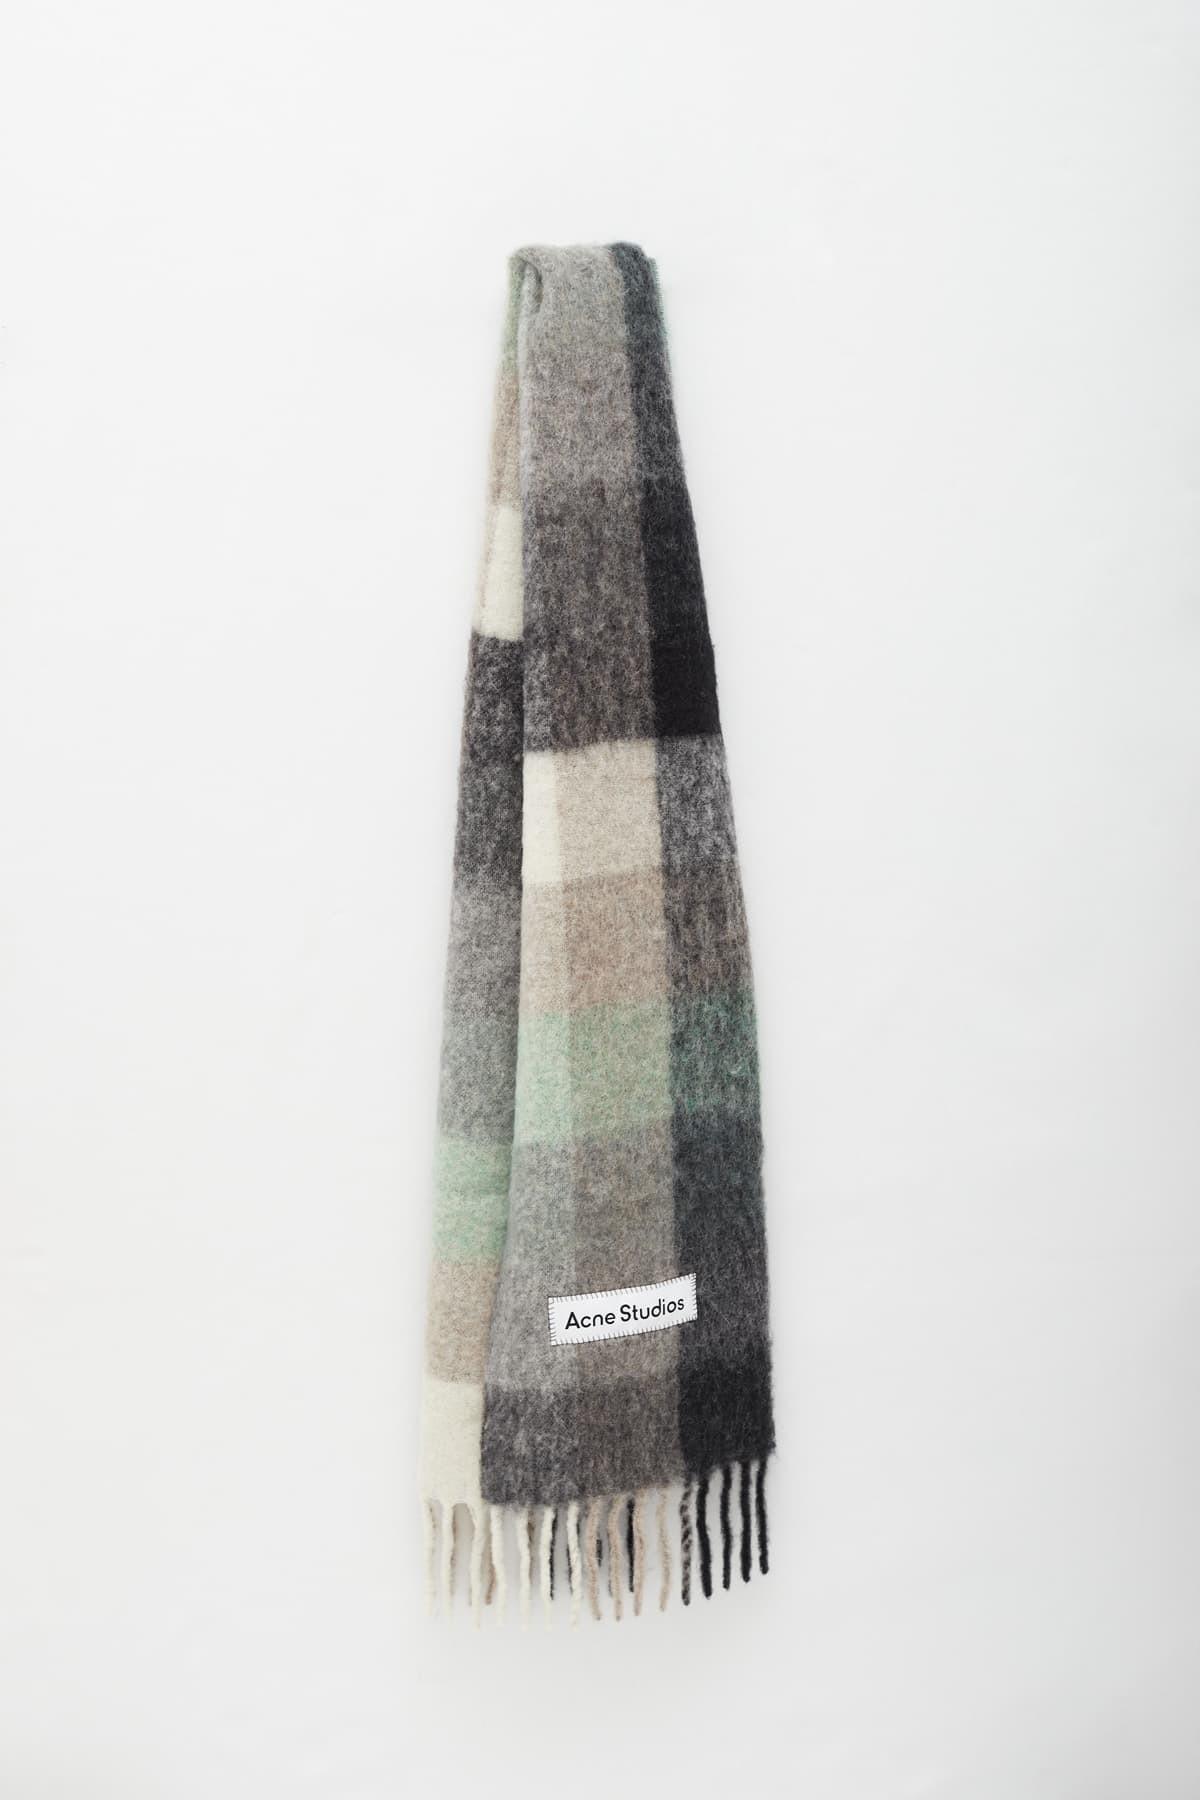 Comprar Acne Studios Old Pink Houston Shirt